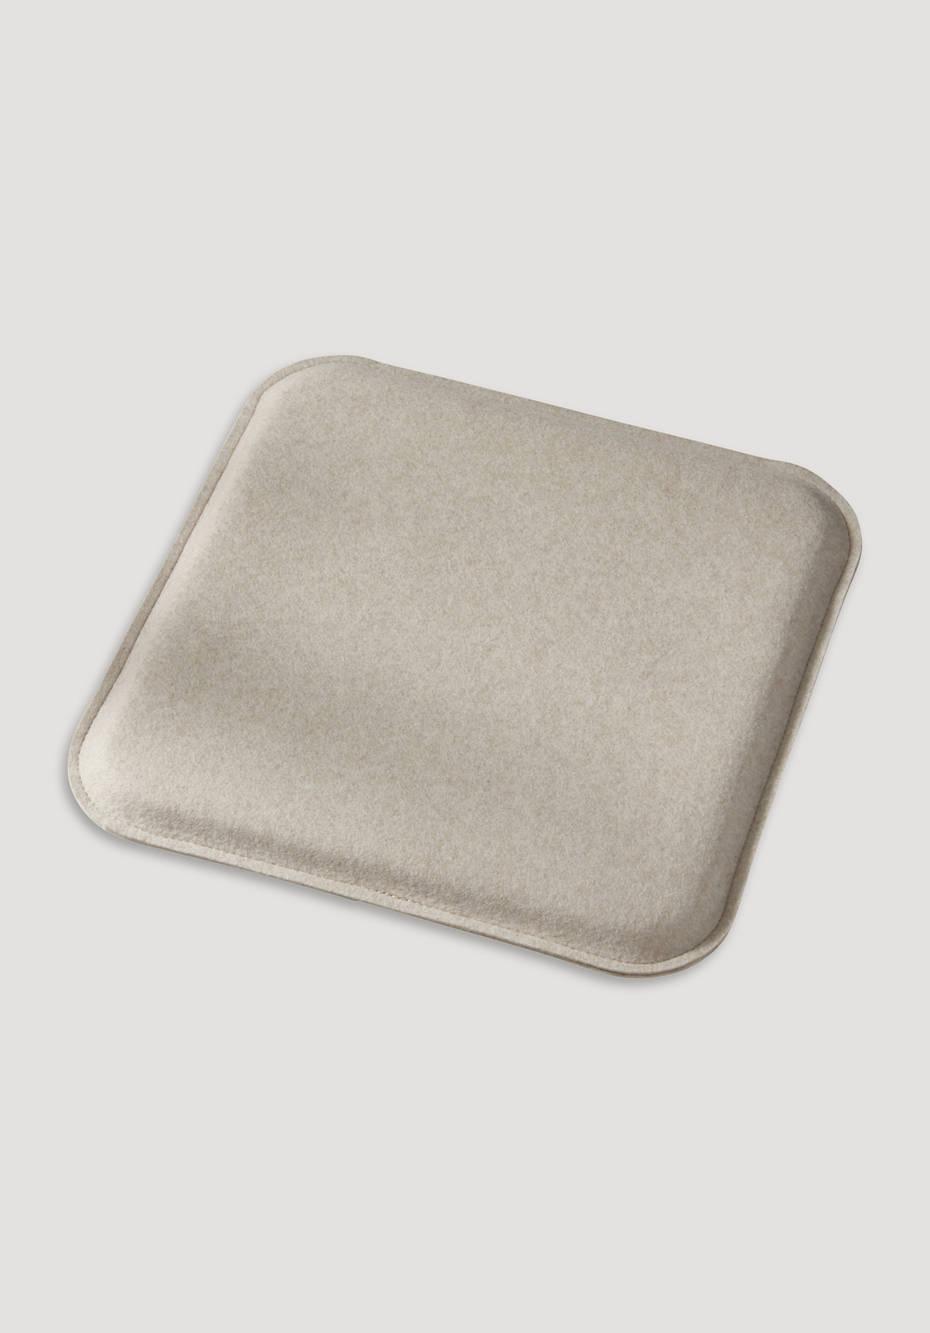 Square felt cushions made of virgin wool